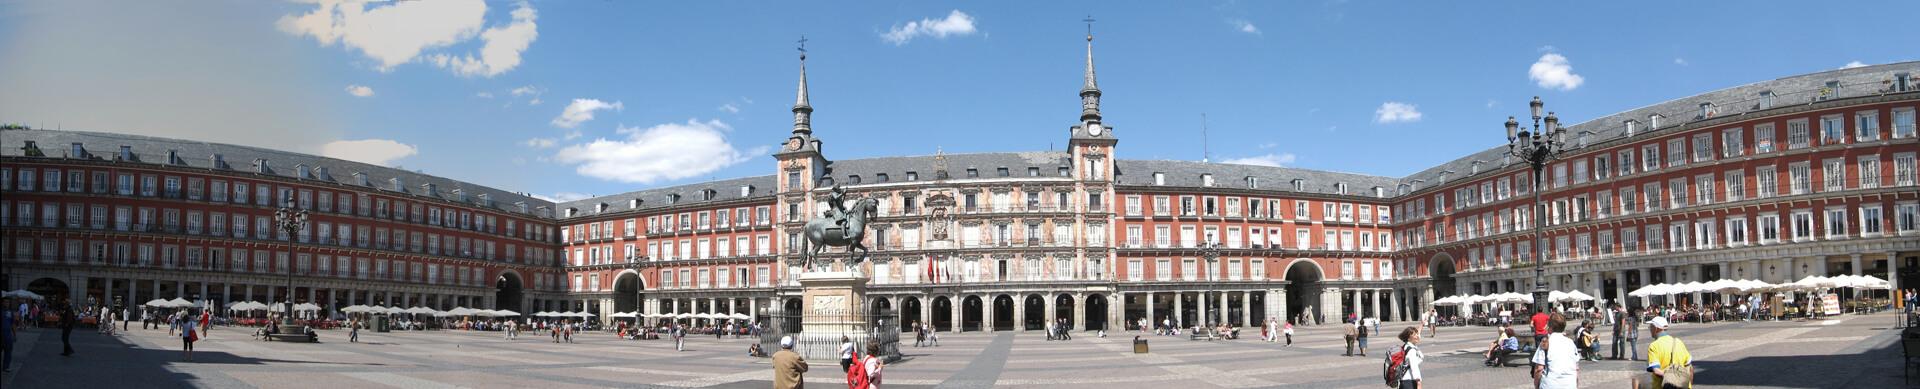 Испанская столица